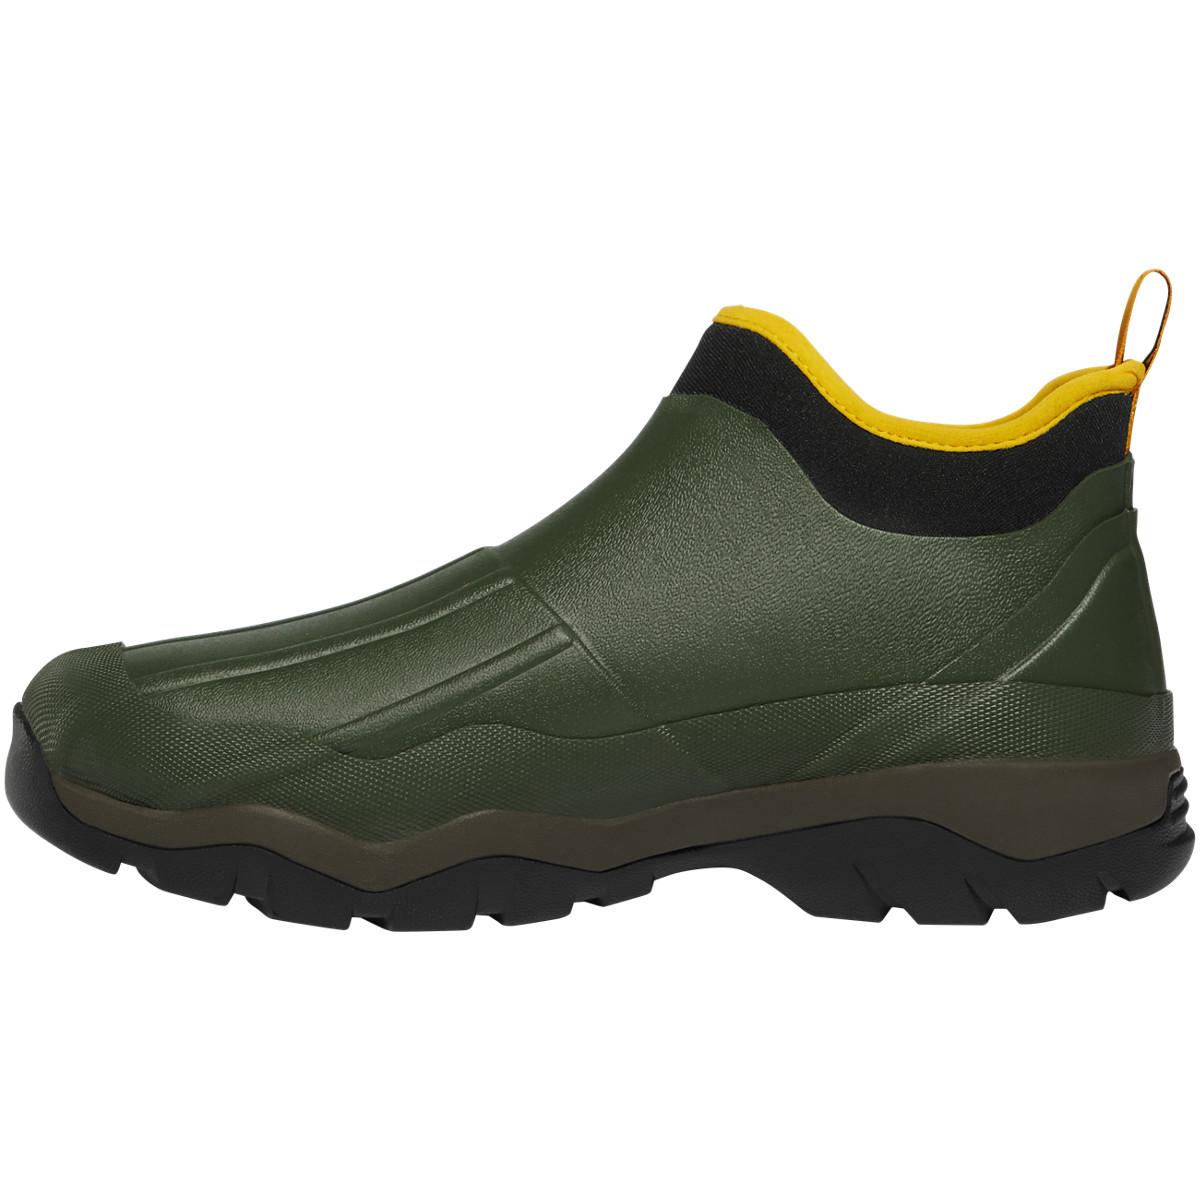 "Alpha Muddy 4.5"" Green"